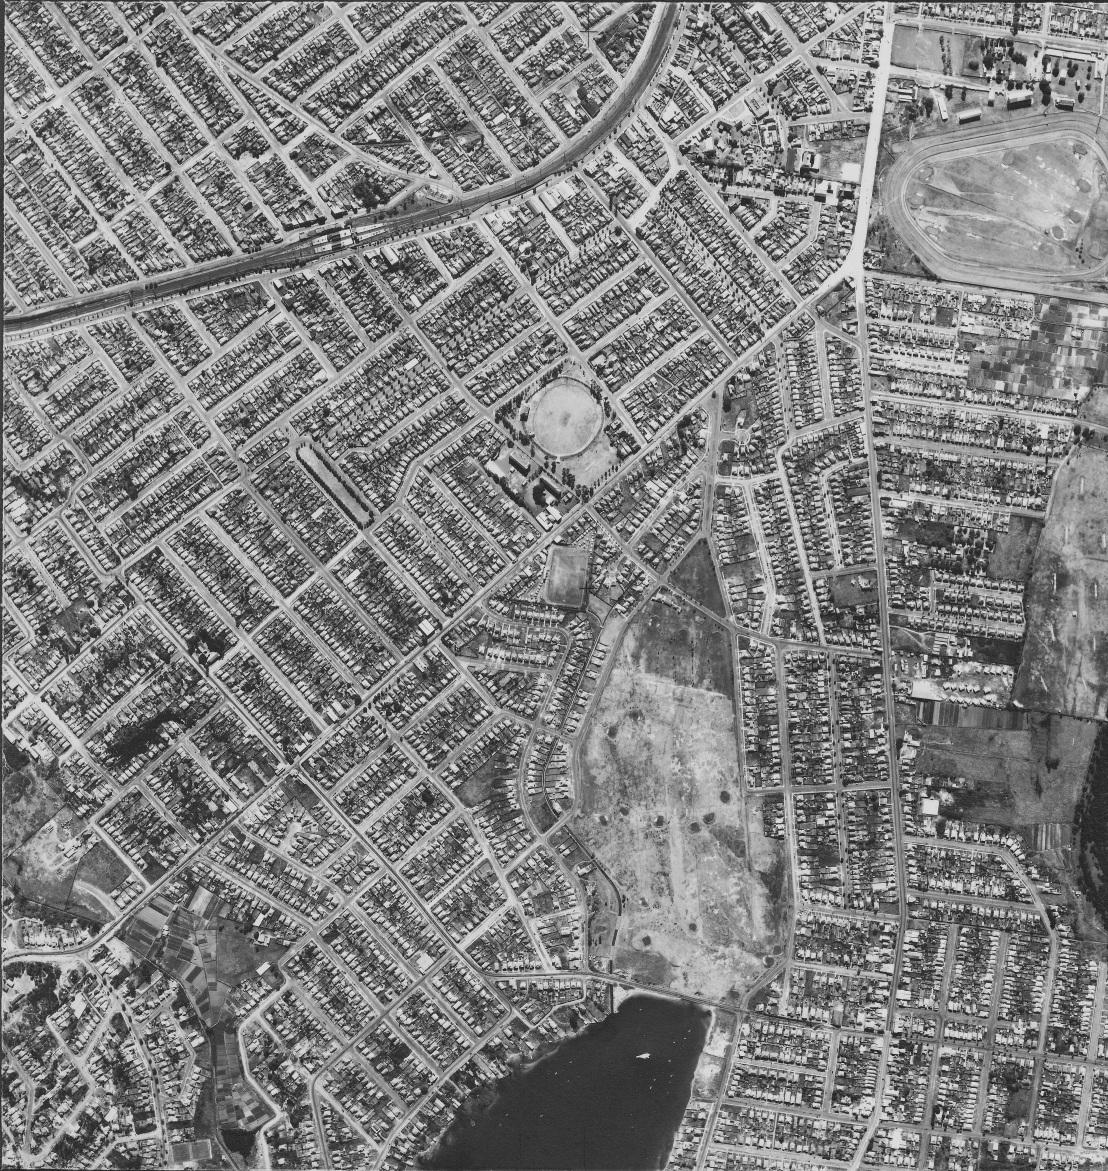 Allawah & Beverley Park 1951 - Sydney aerial photo.jpg